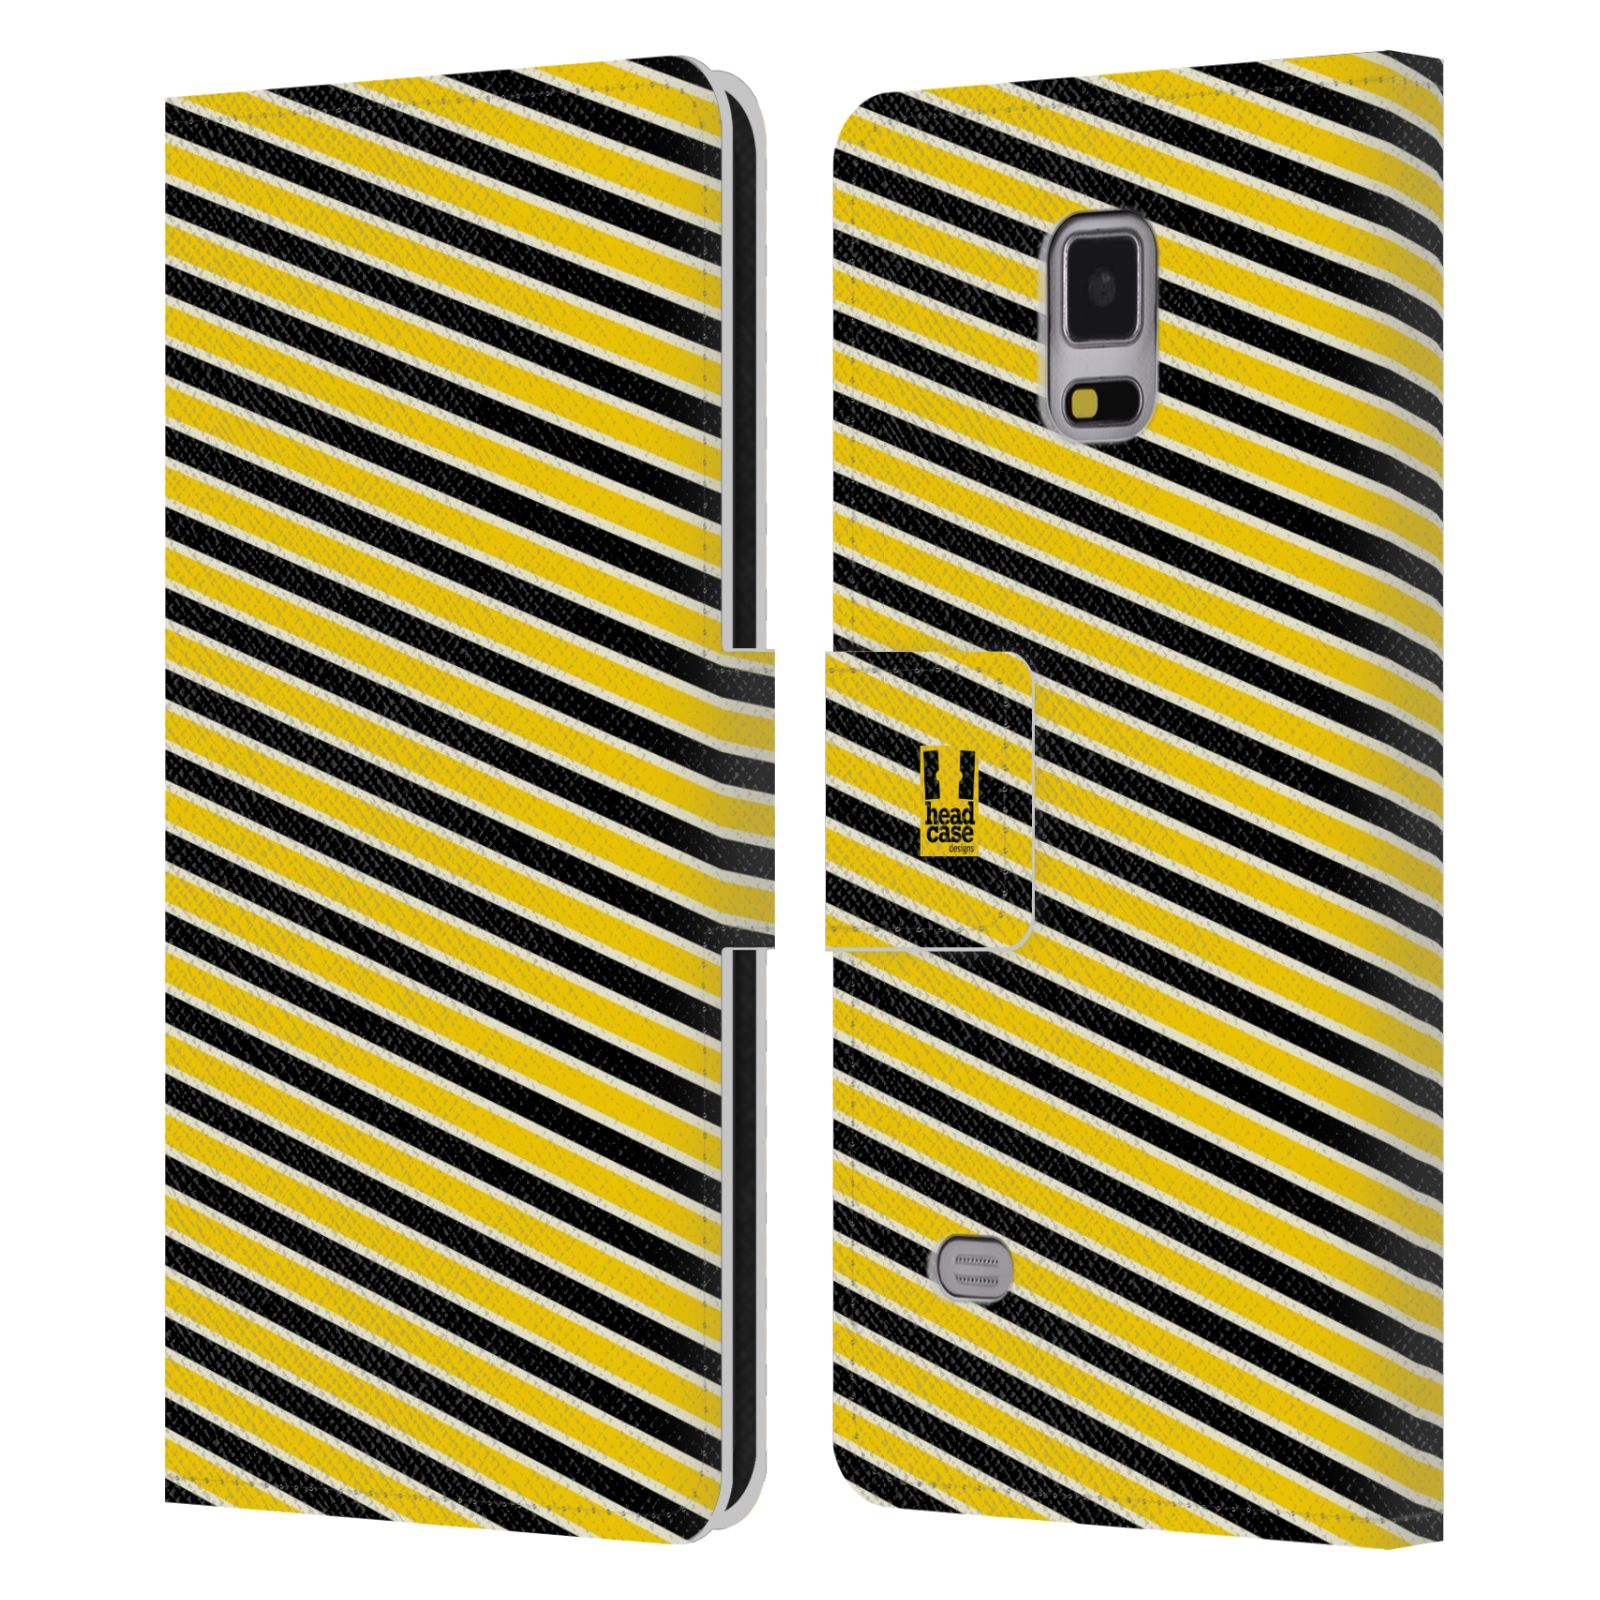 HEAD CASE Flipové pouzdro pro mobil Samsung Galaxy Note 4 VČELÍ VZOR pruhy žlutá a černá